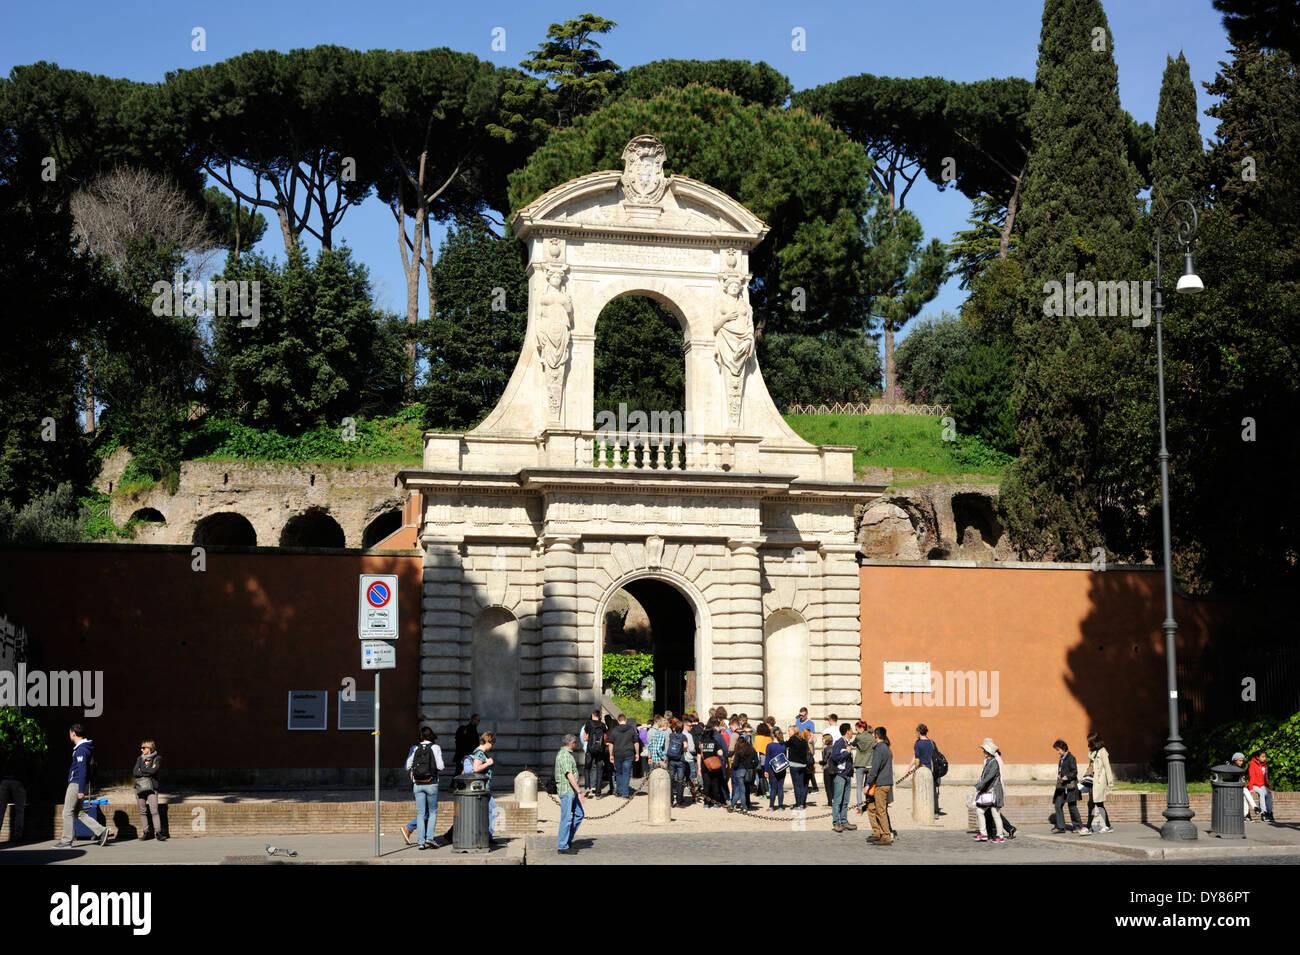 italy, rome, palatine hill, main entrance gate - Stock Image